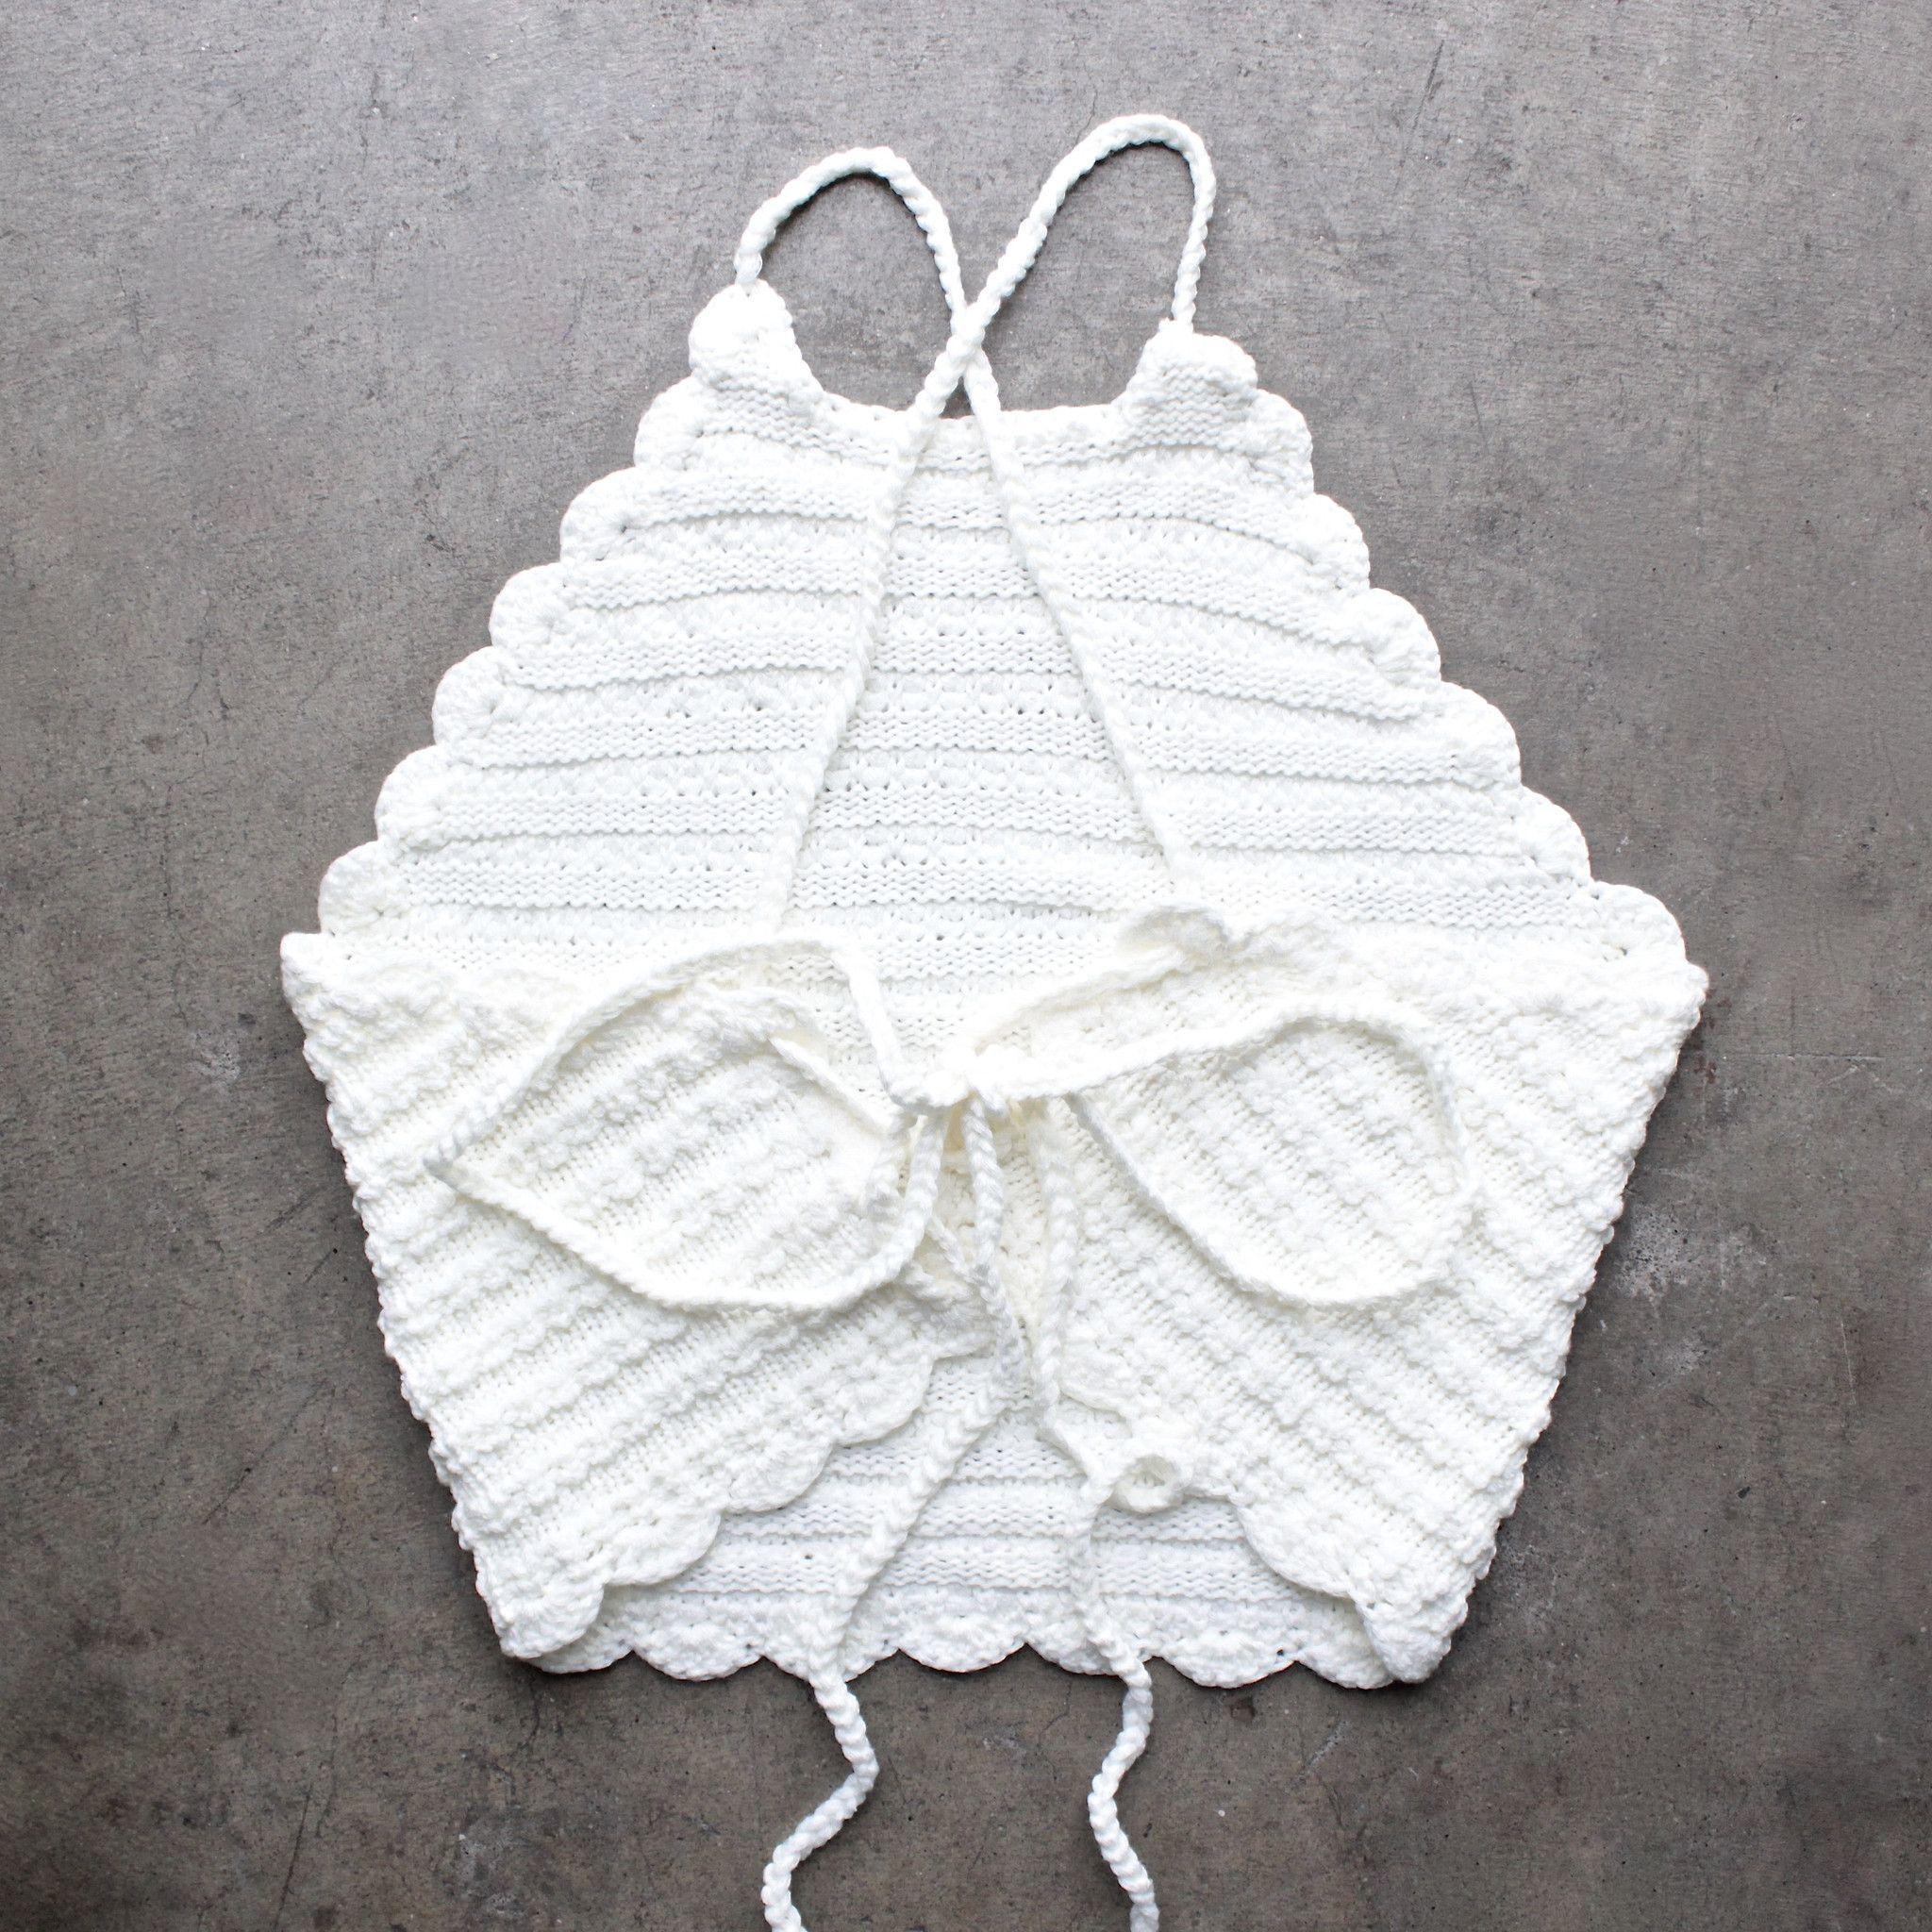 festival shop - crochet halter crop top | tejidos | Pinterest ...